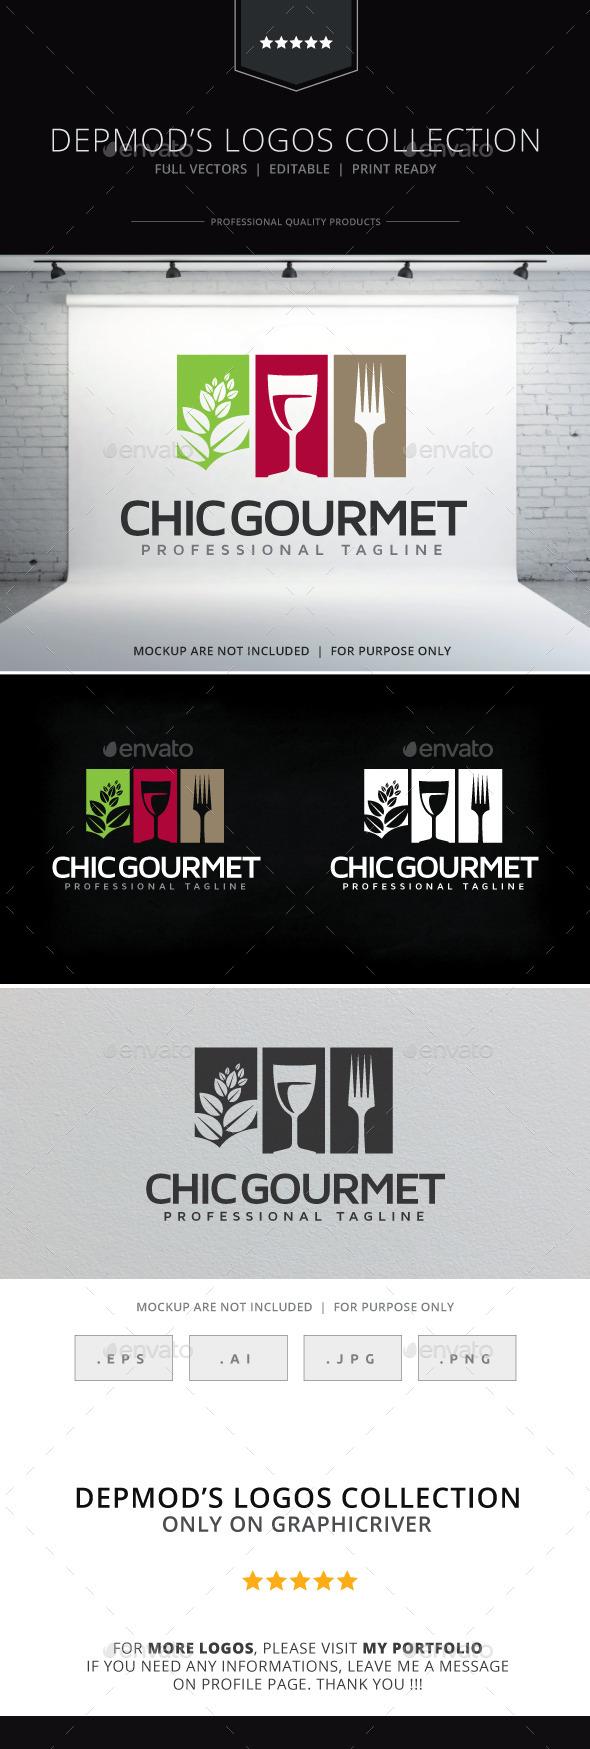 GraphicRiver Chic Gourmet Logo 10255321